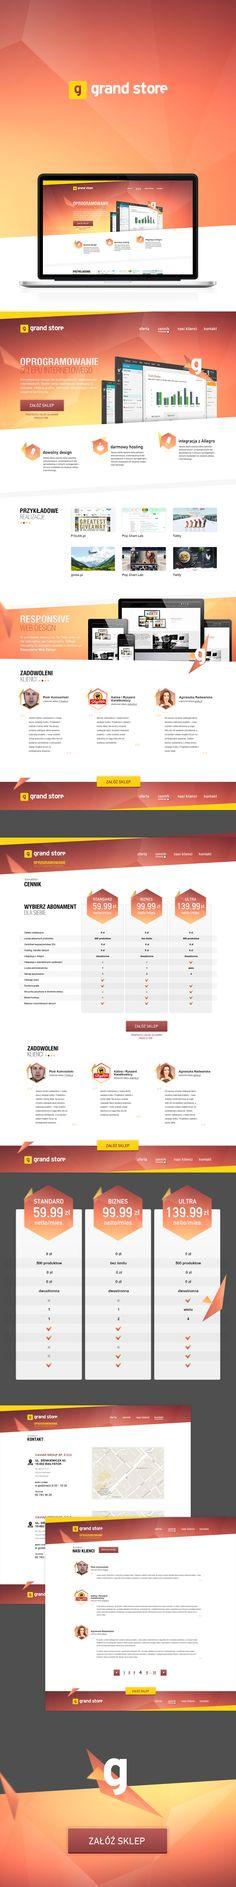 Web design. Logo and design for GrandStore.